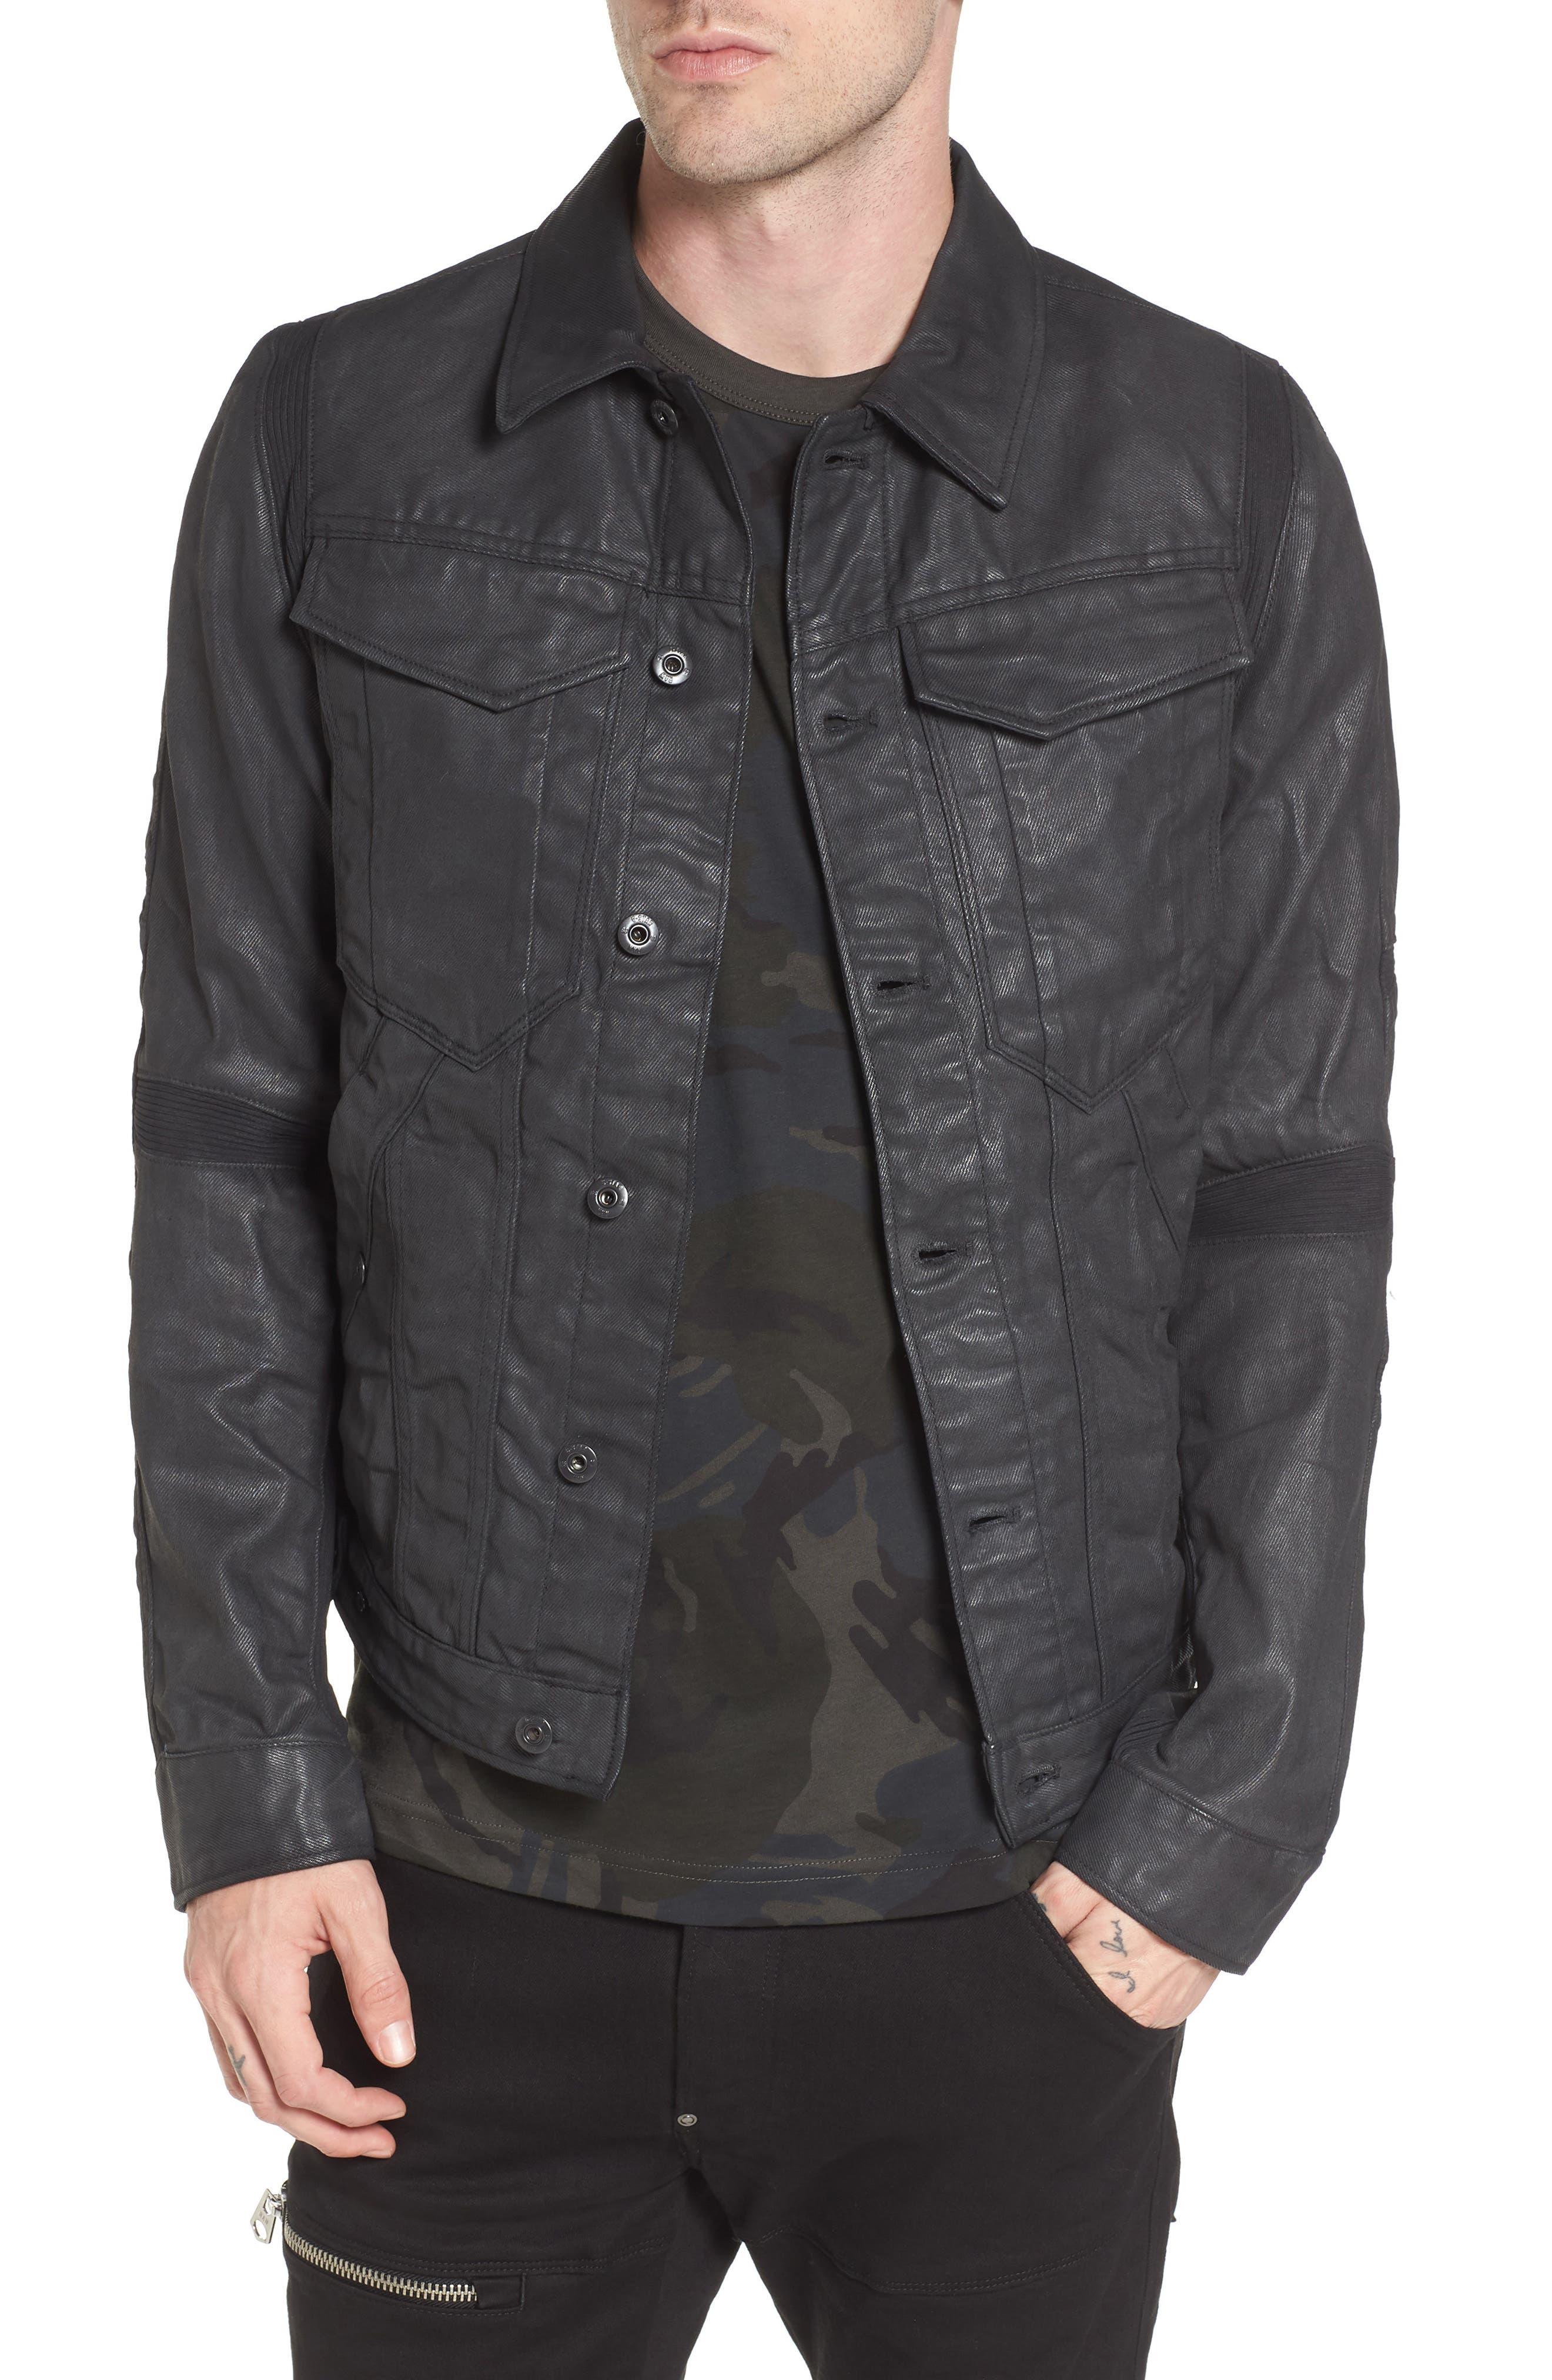 G-Star Raw Motac 3D Slim Denim Jacket